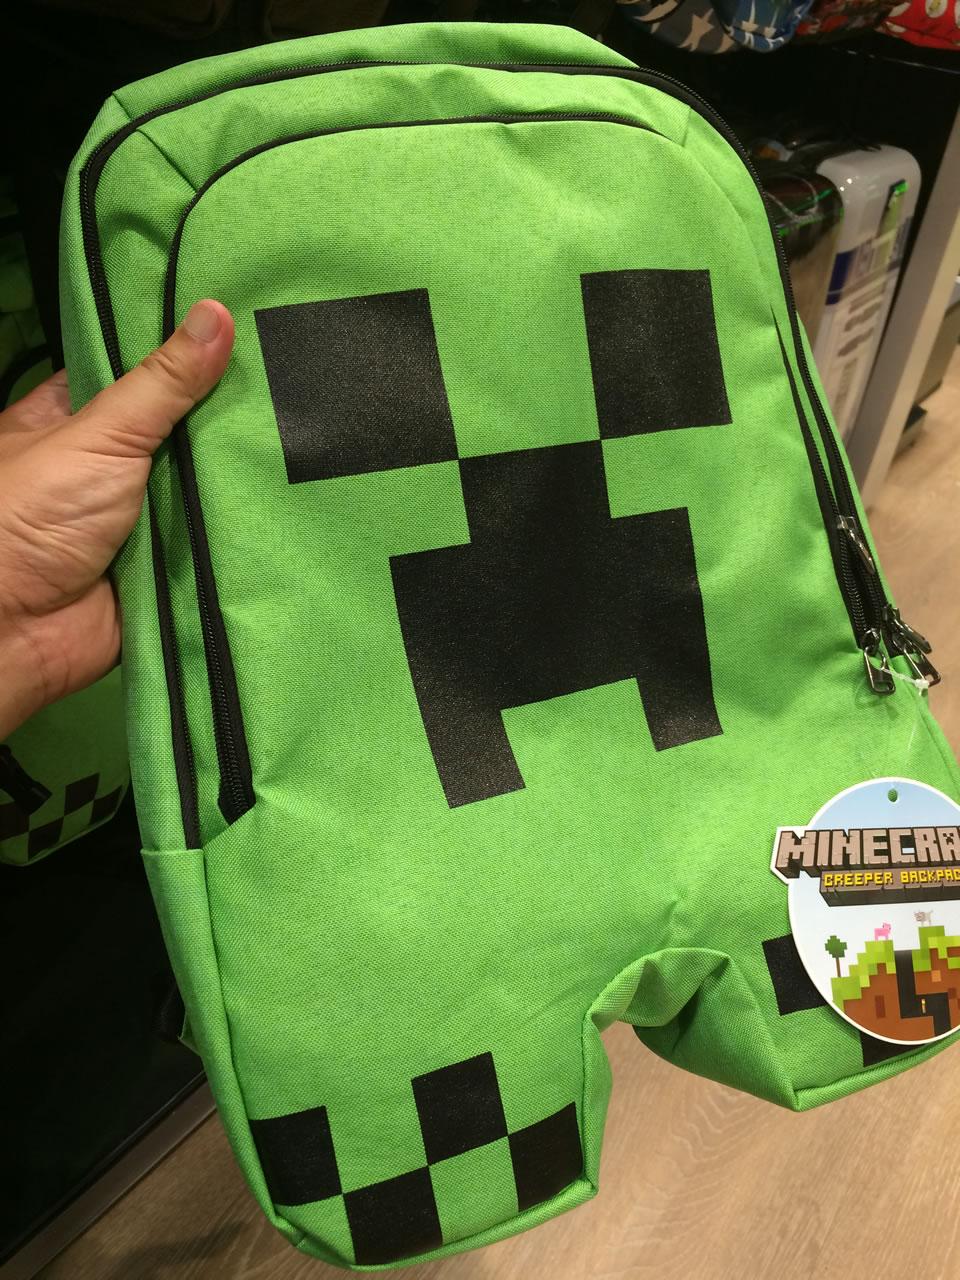 57 thinkgeek store - creeper bag